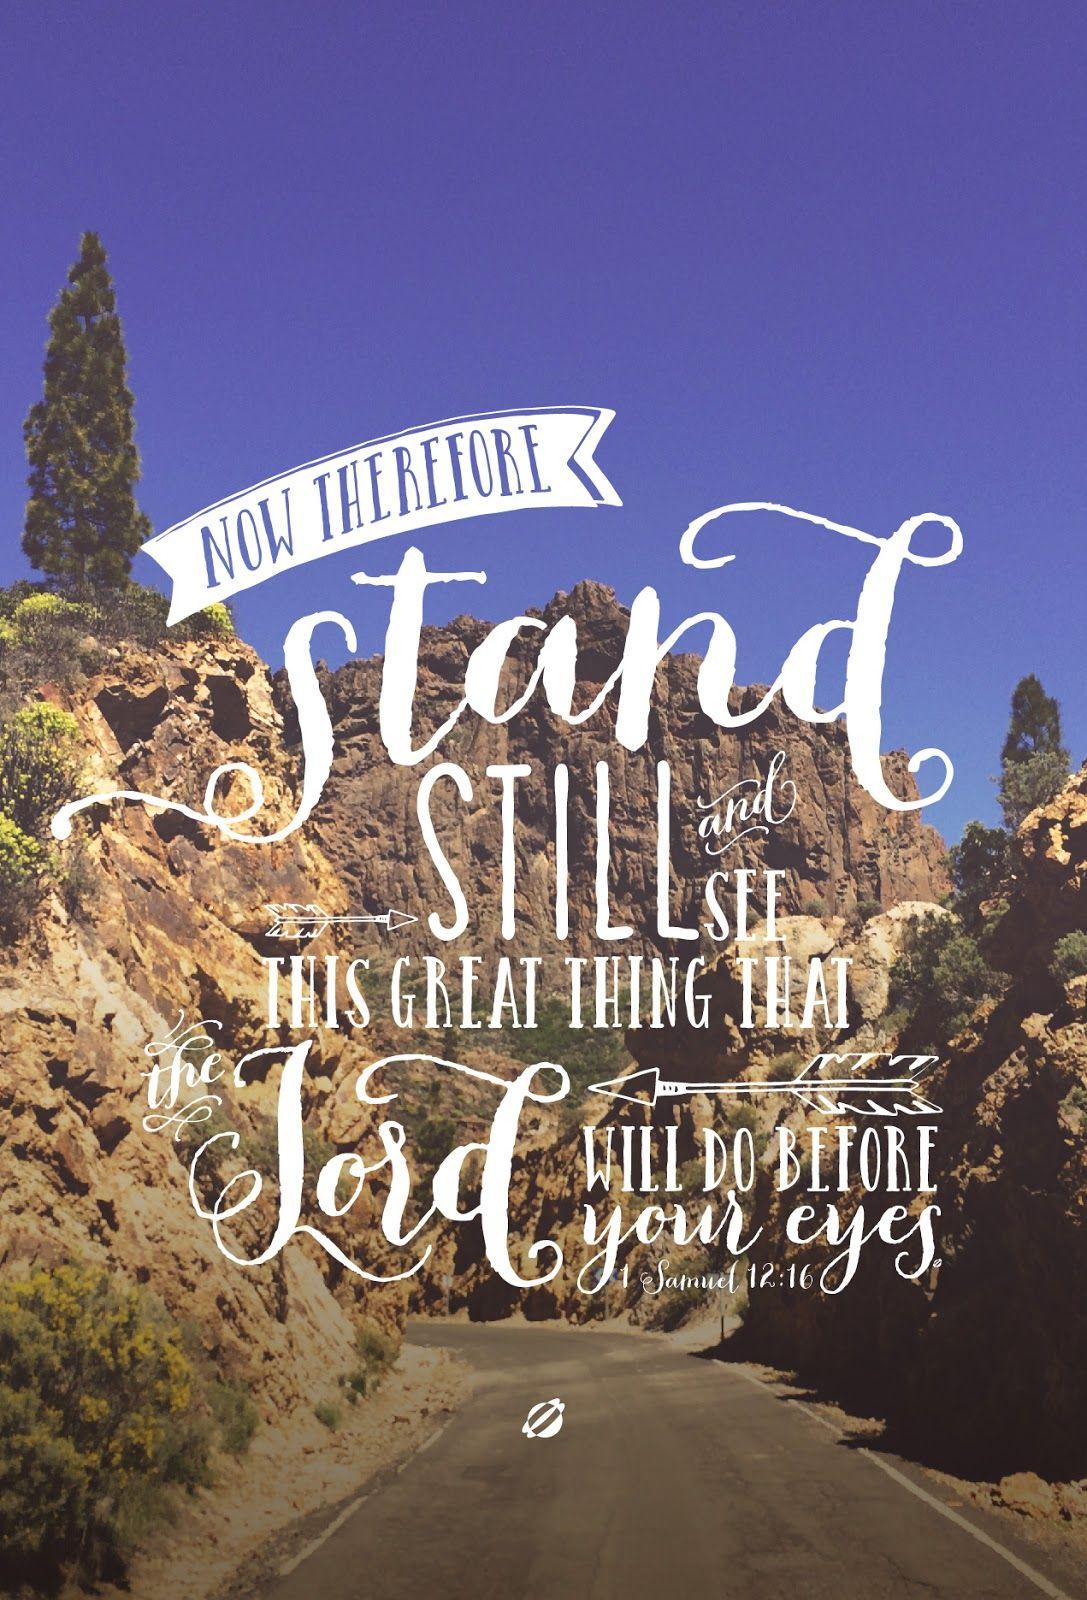 Cute Pintrest Quote Wallpapers Lostbumblebee 169 2015 Bible Verse 1 Samuel 12 16 Free